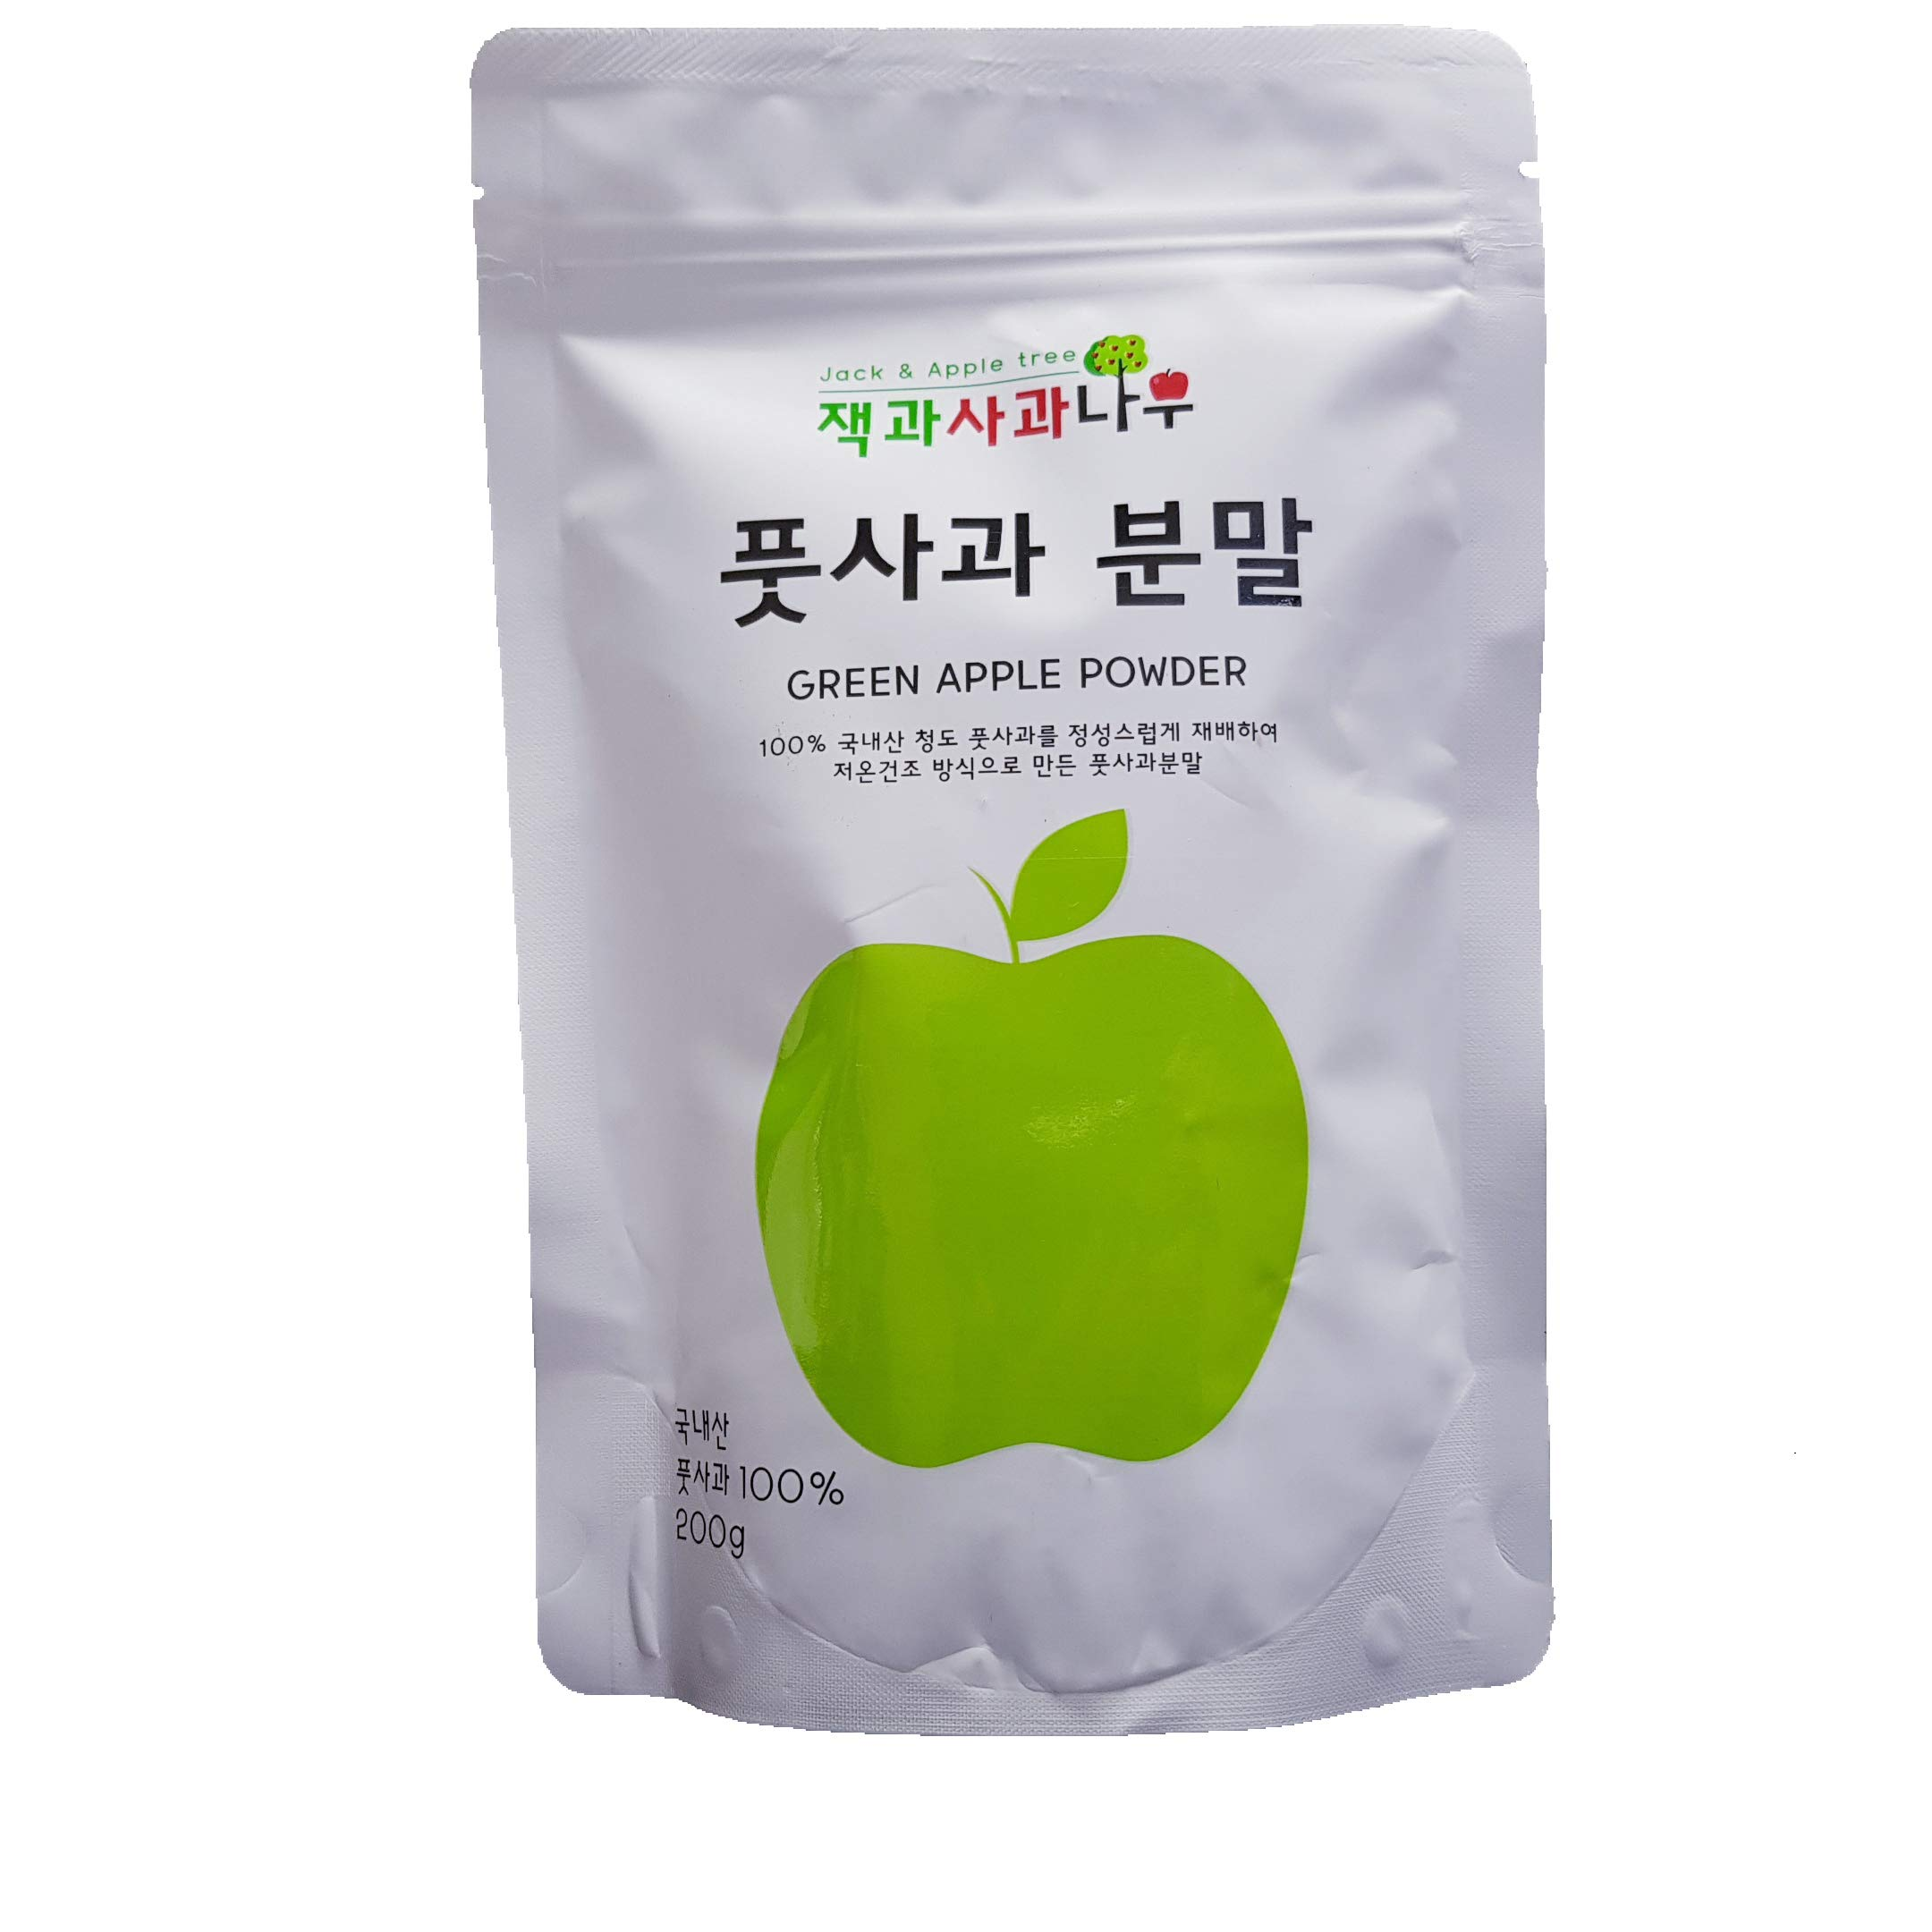 Korean Healthy Natural 100% Unripe Green Apple Extract Powder Kfood Mukbang 7.05oz Vitamin C Organic Gap Jack & Apple tree[ 풋사과 분말] by Jack & Apple tree